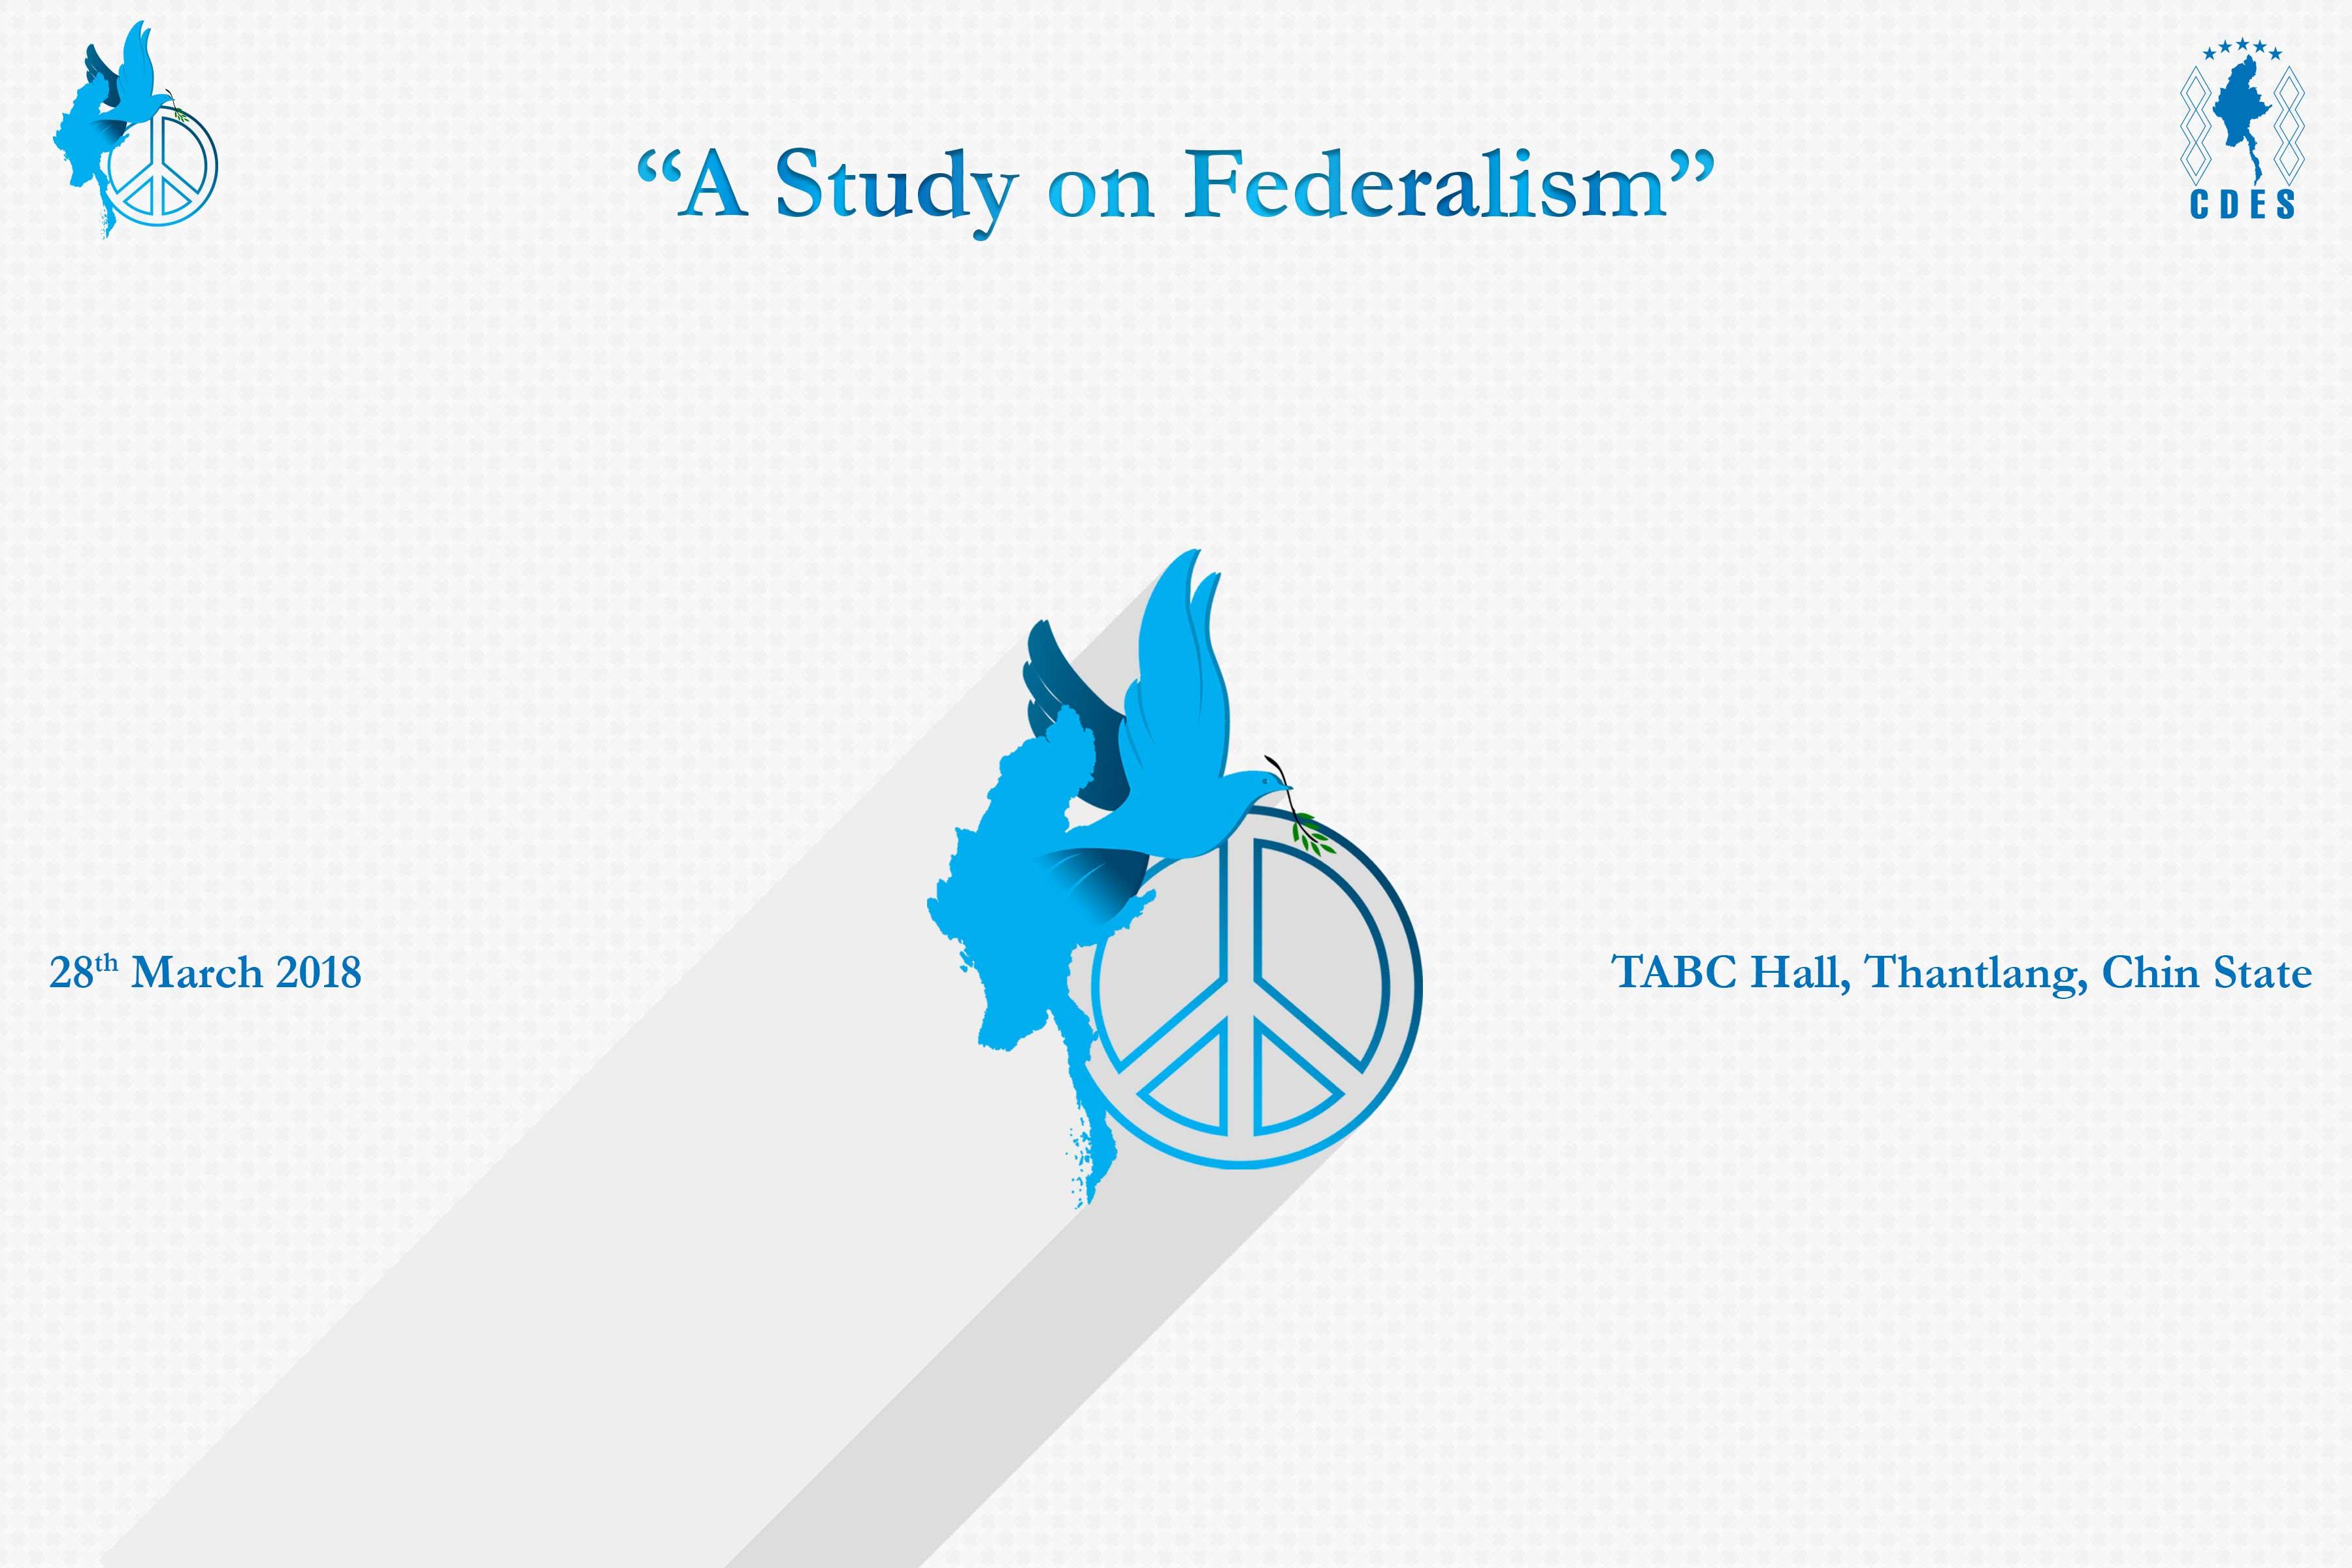 A Study on Federalism